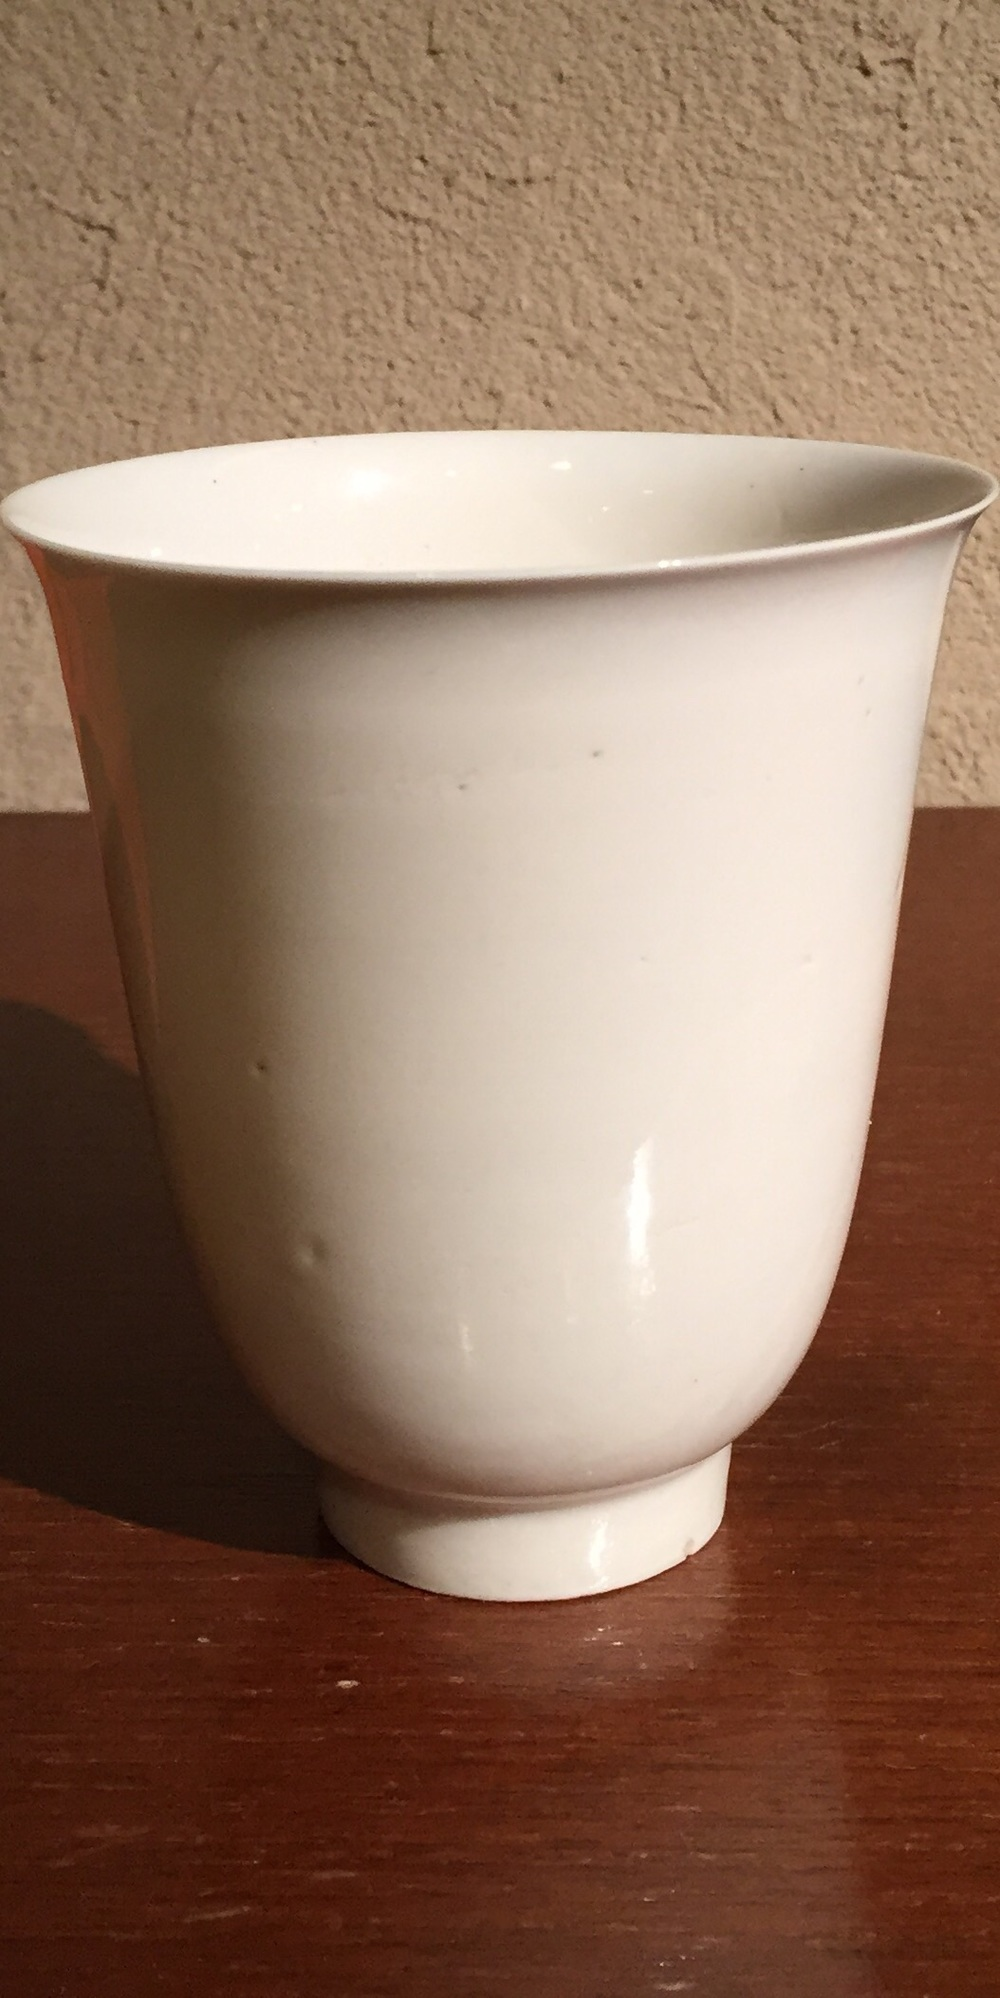 White pocelain cup.